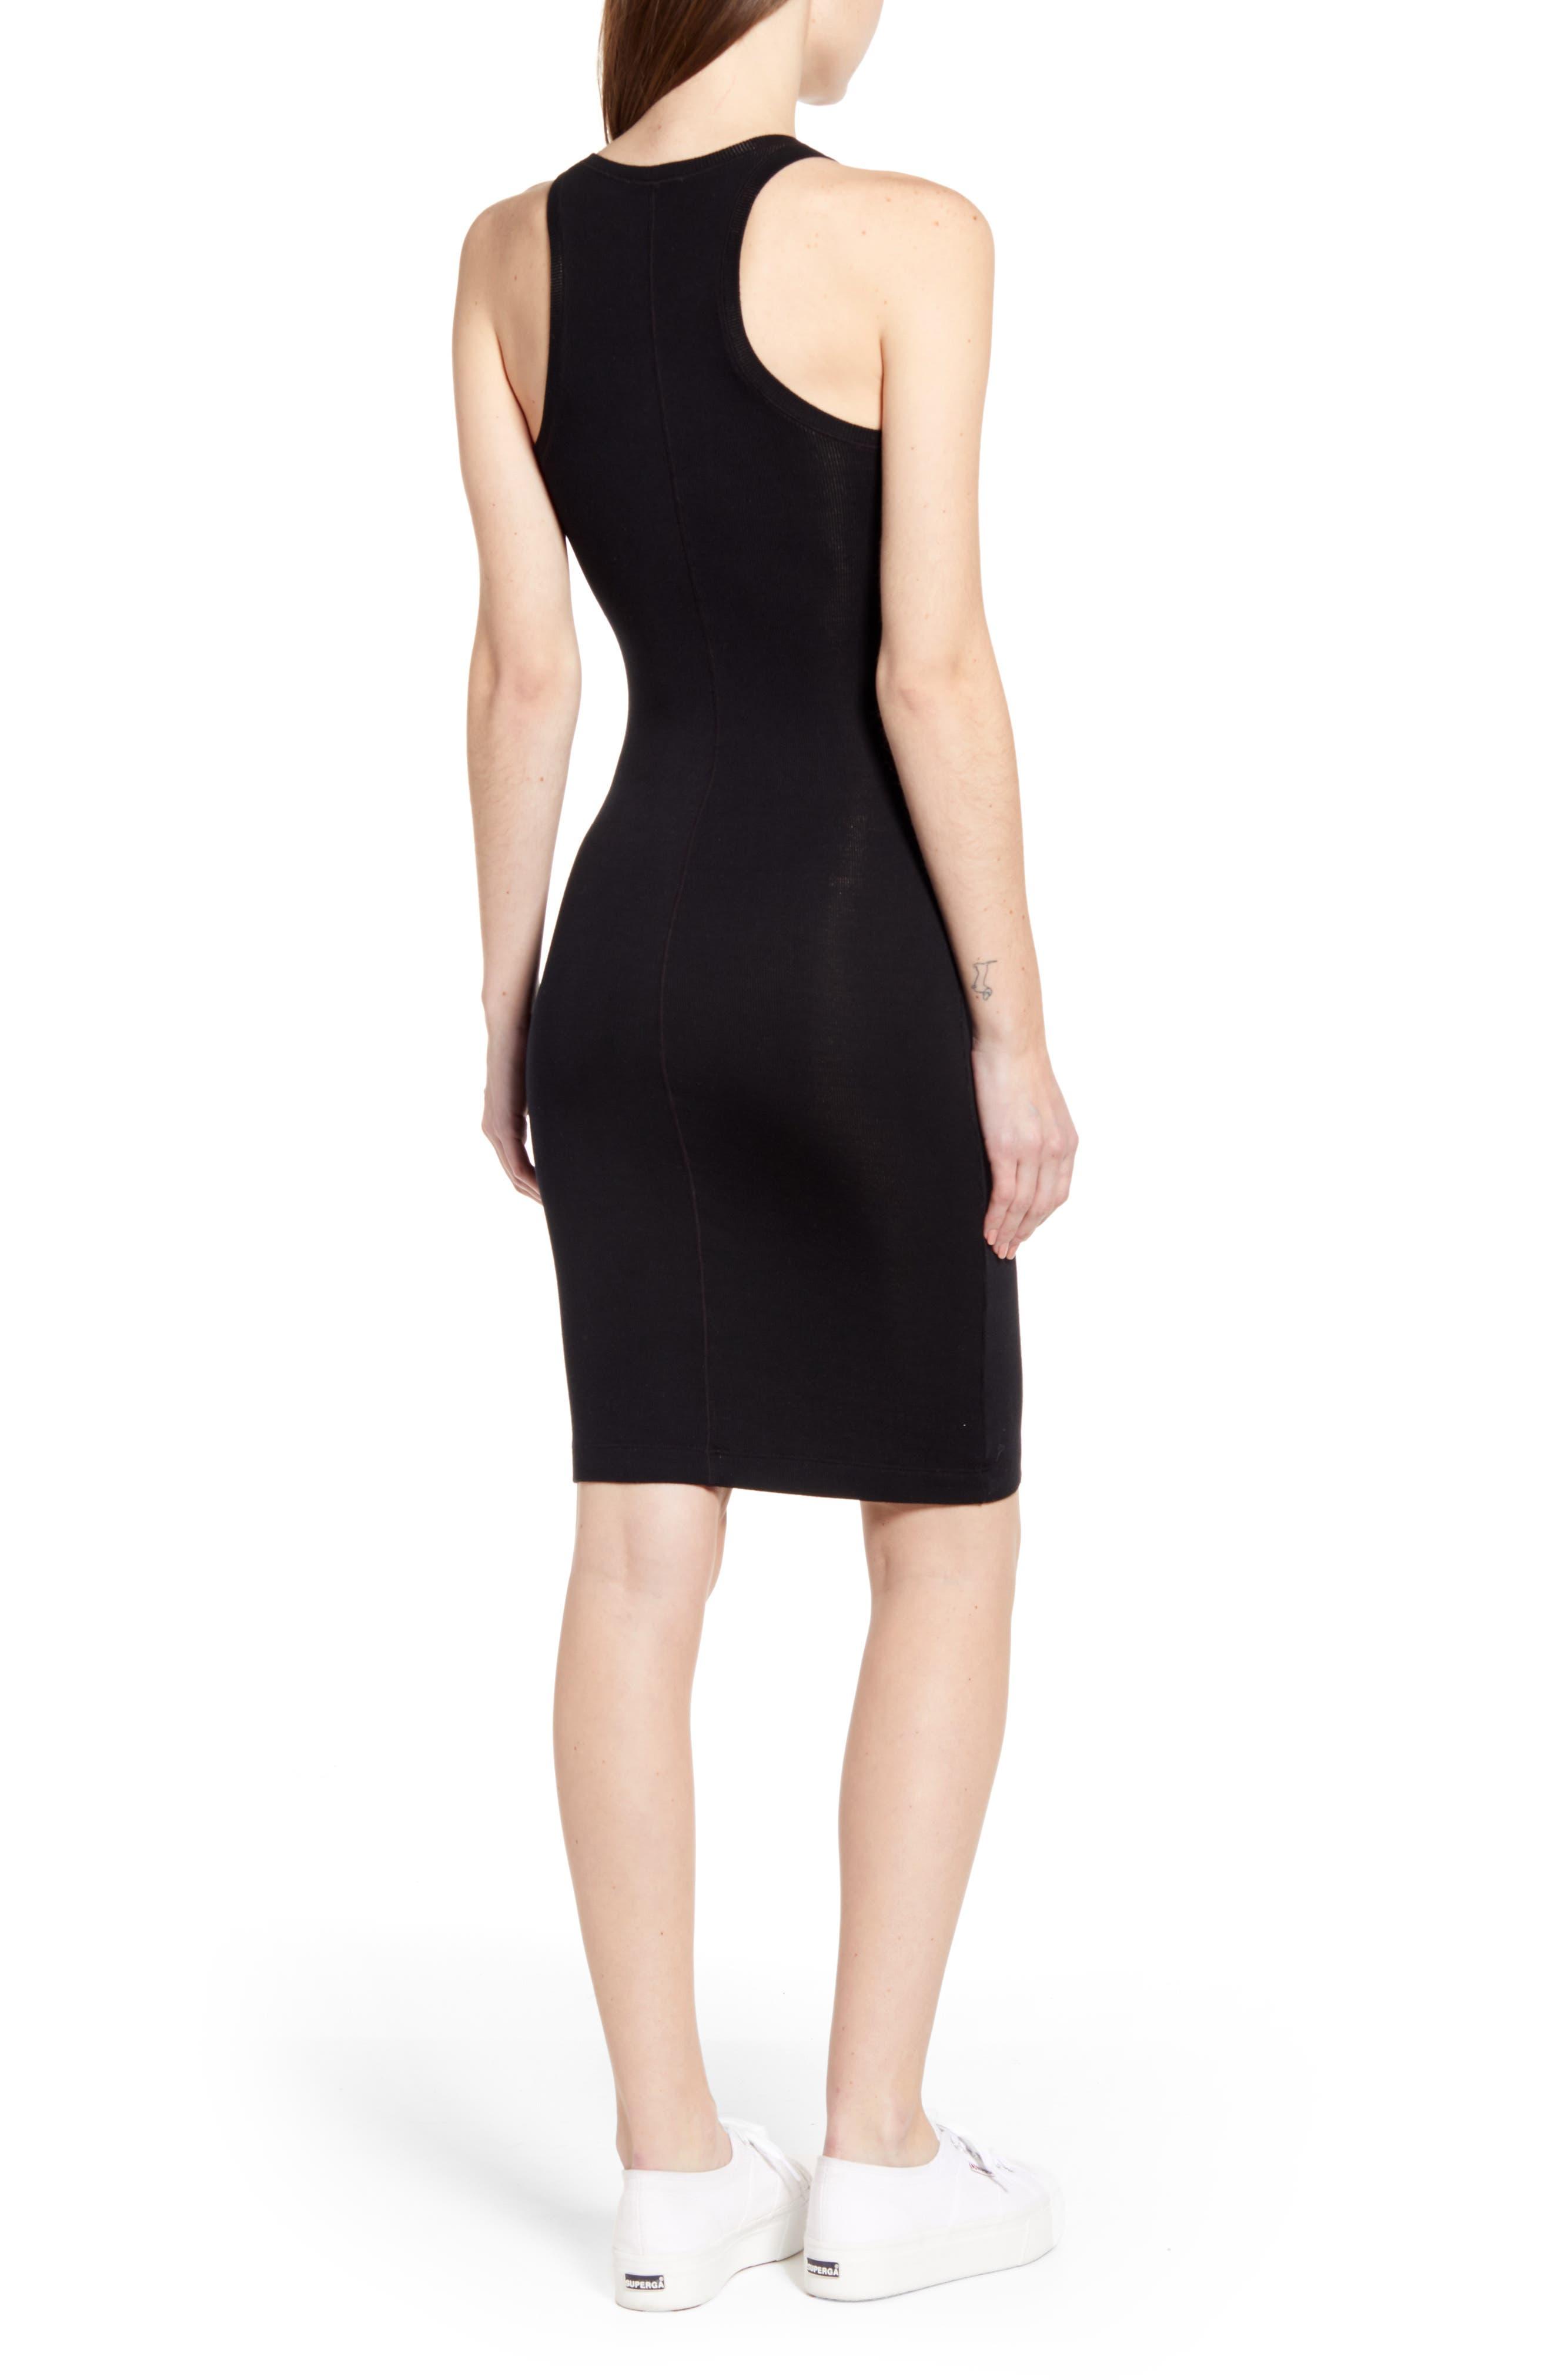 SPLENDID, Racerback Knit Dress, Alternate thumbnail 2, color, BLACK